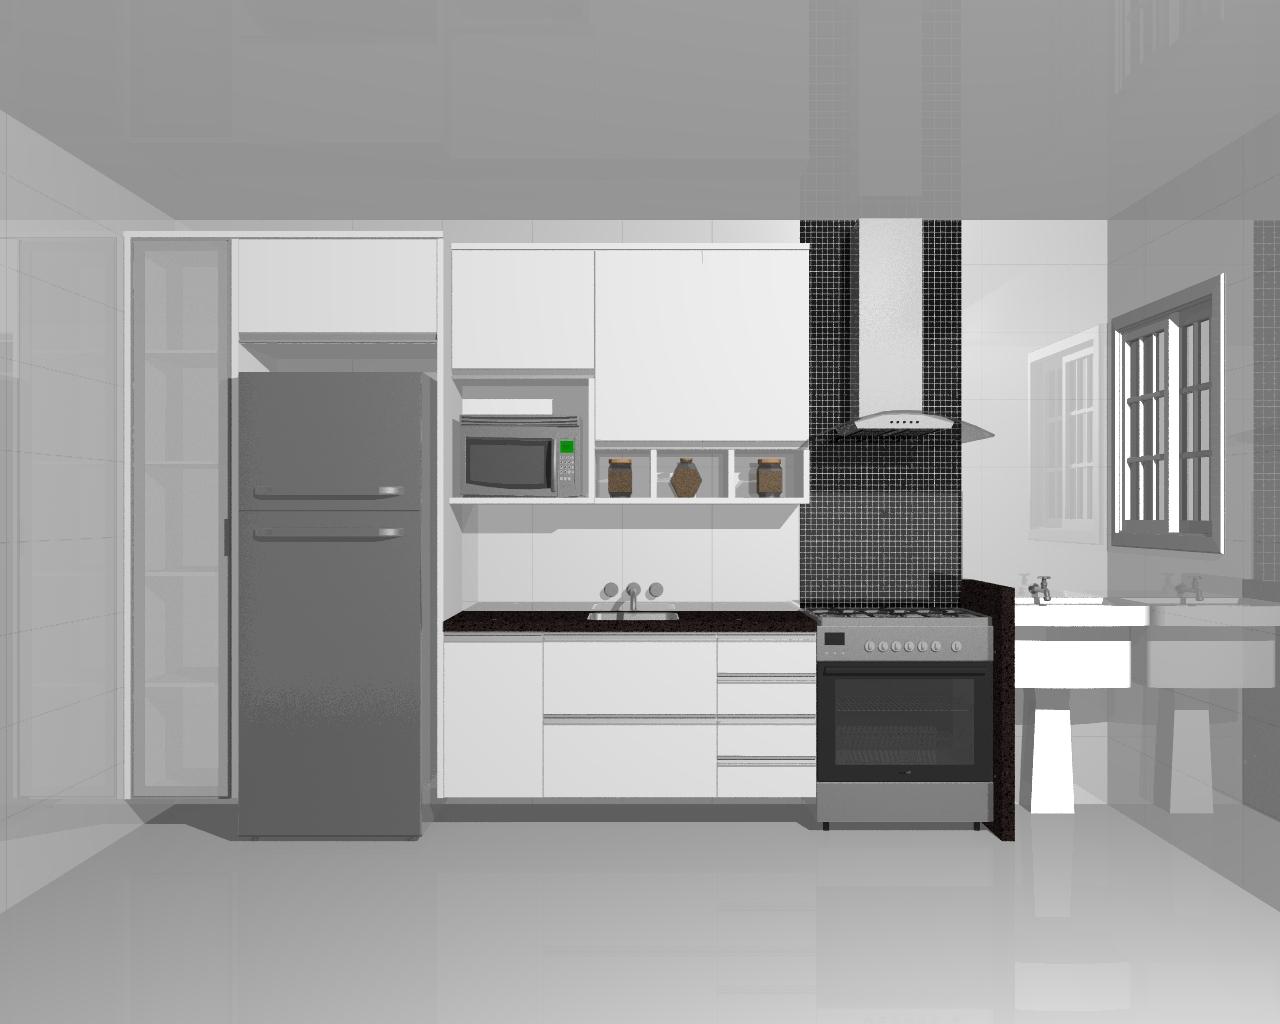 apartamento mrv projetos apartamento mrv projetos apartamento mrv #3D713D 1280 1024